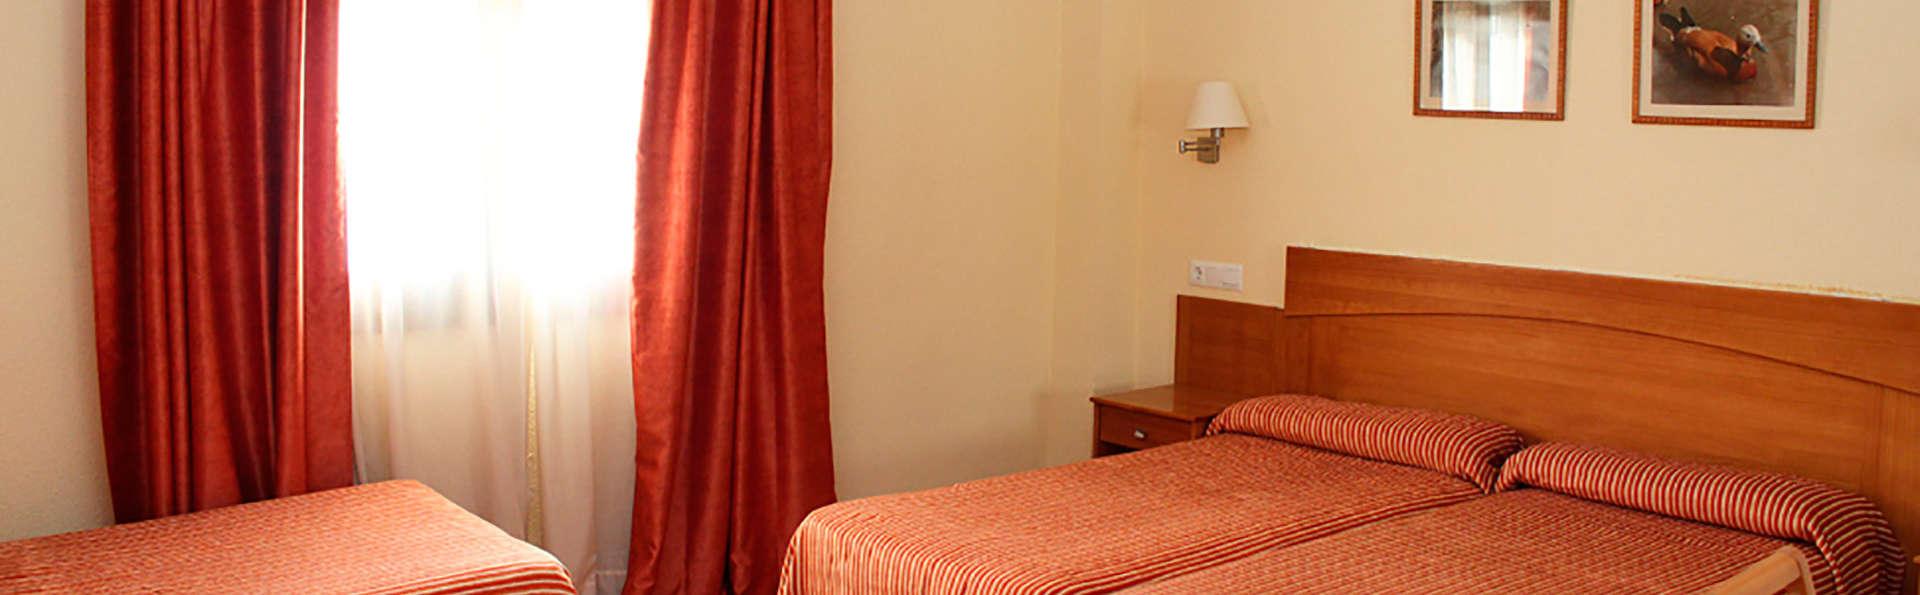 Hotel Las Tablas - EDIT_room6.jpg